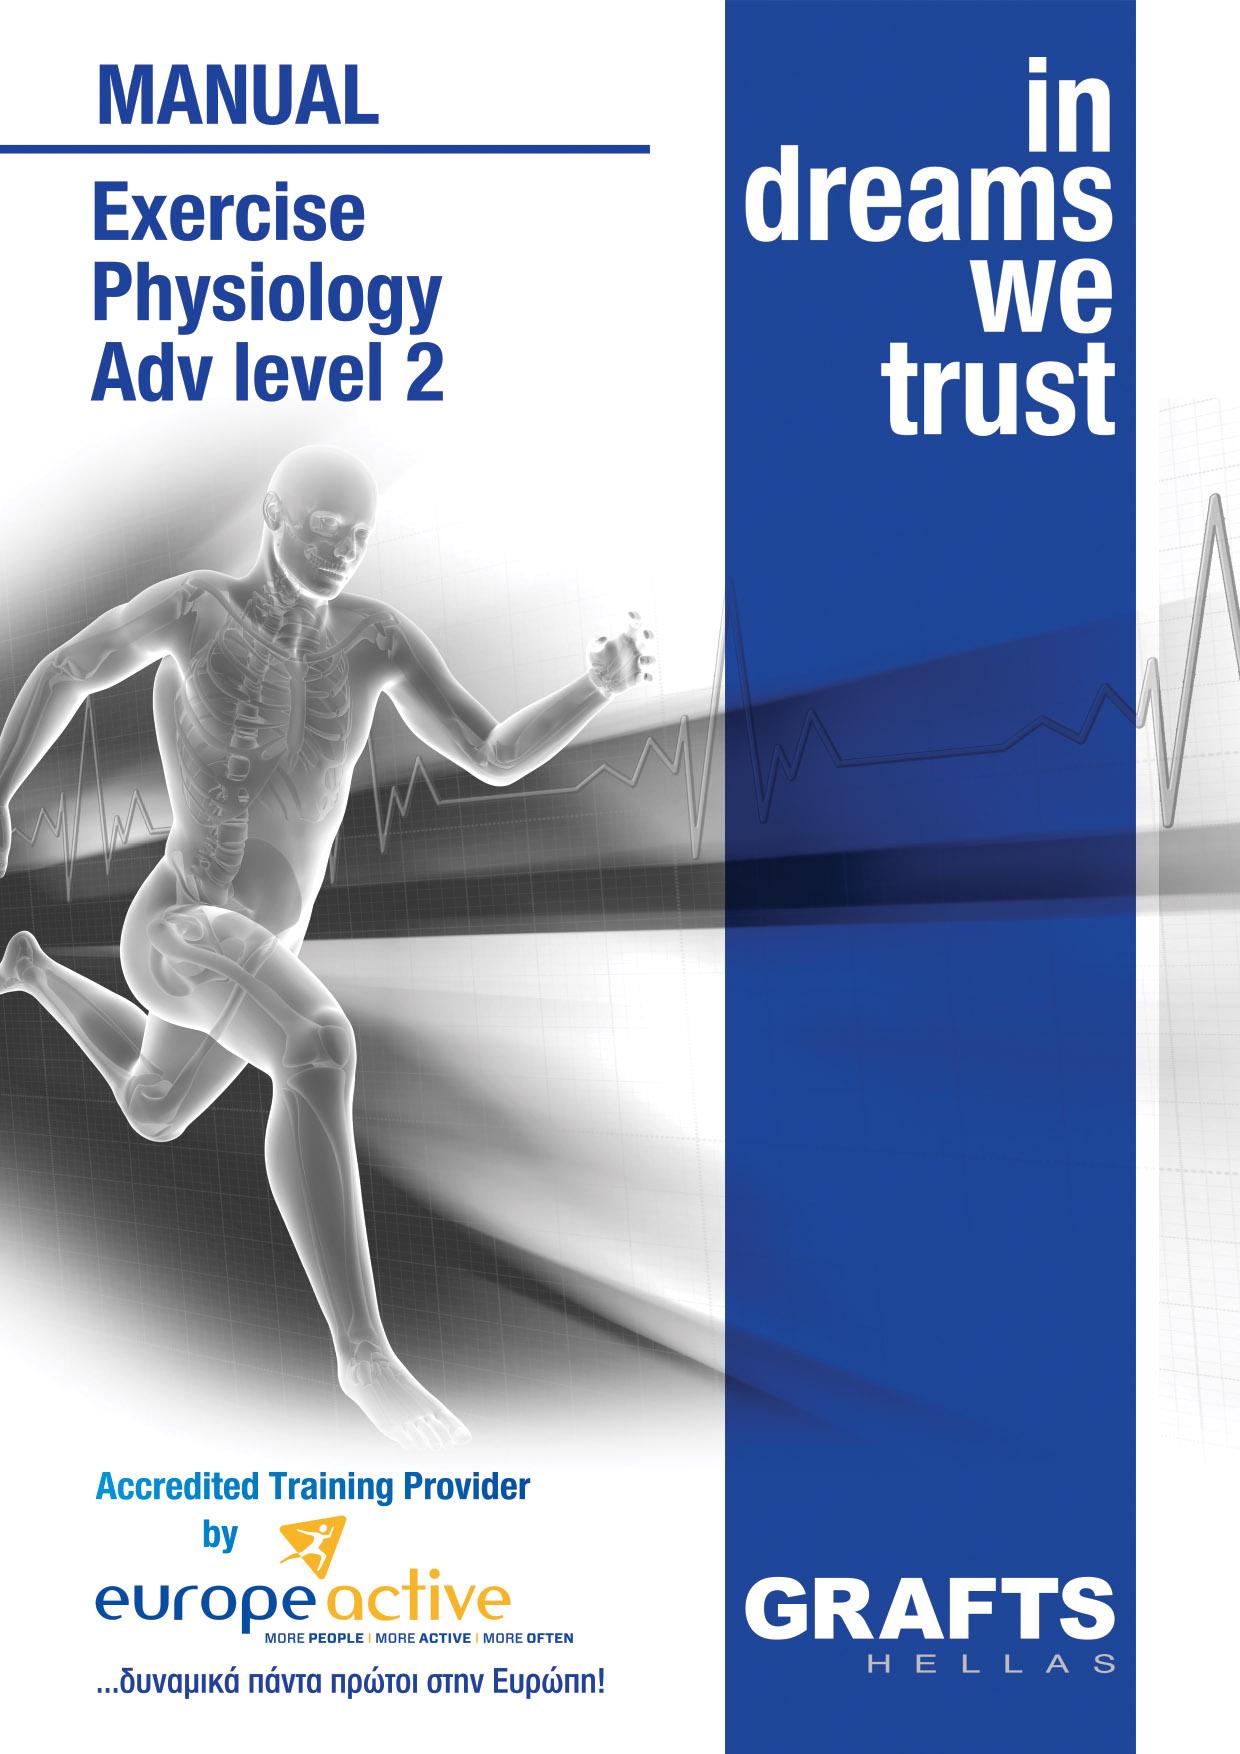 Grafts Hellas manual - Φυσιολογία της Άσκησης - Adv Level 2